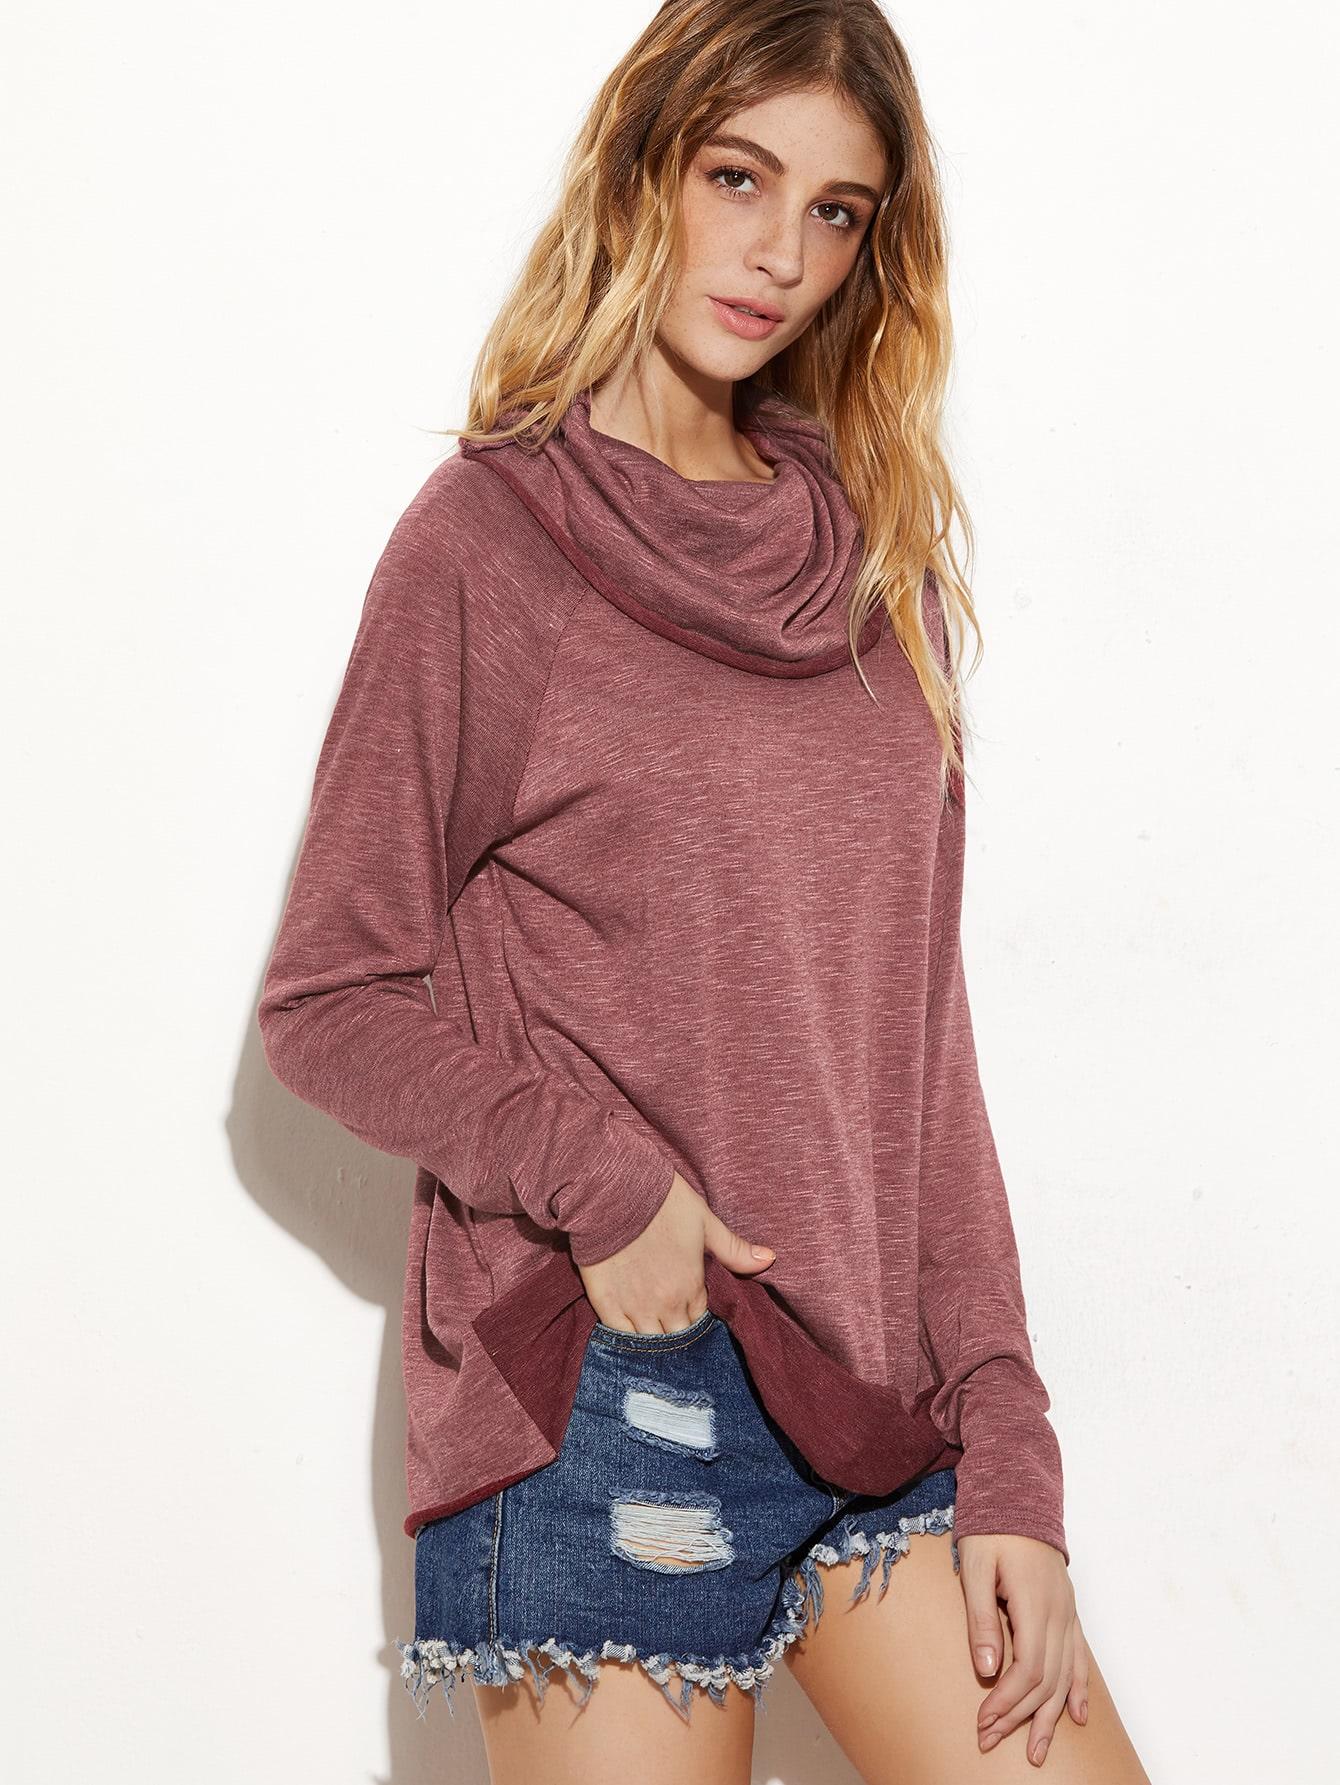 Burgundy Marled Cowl Neck Raglan Sleeve T-shirt studio m new burgundy red marled women s size large l boat neck sweater $98